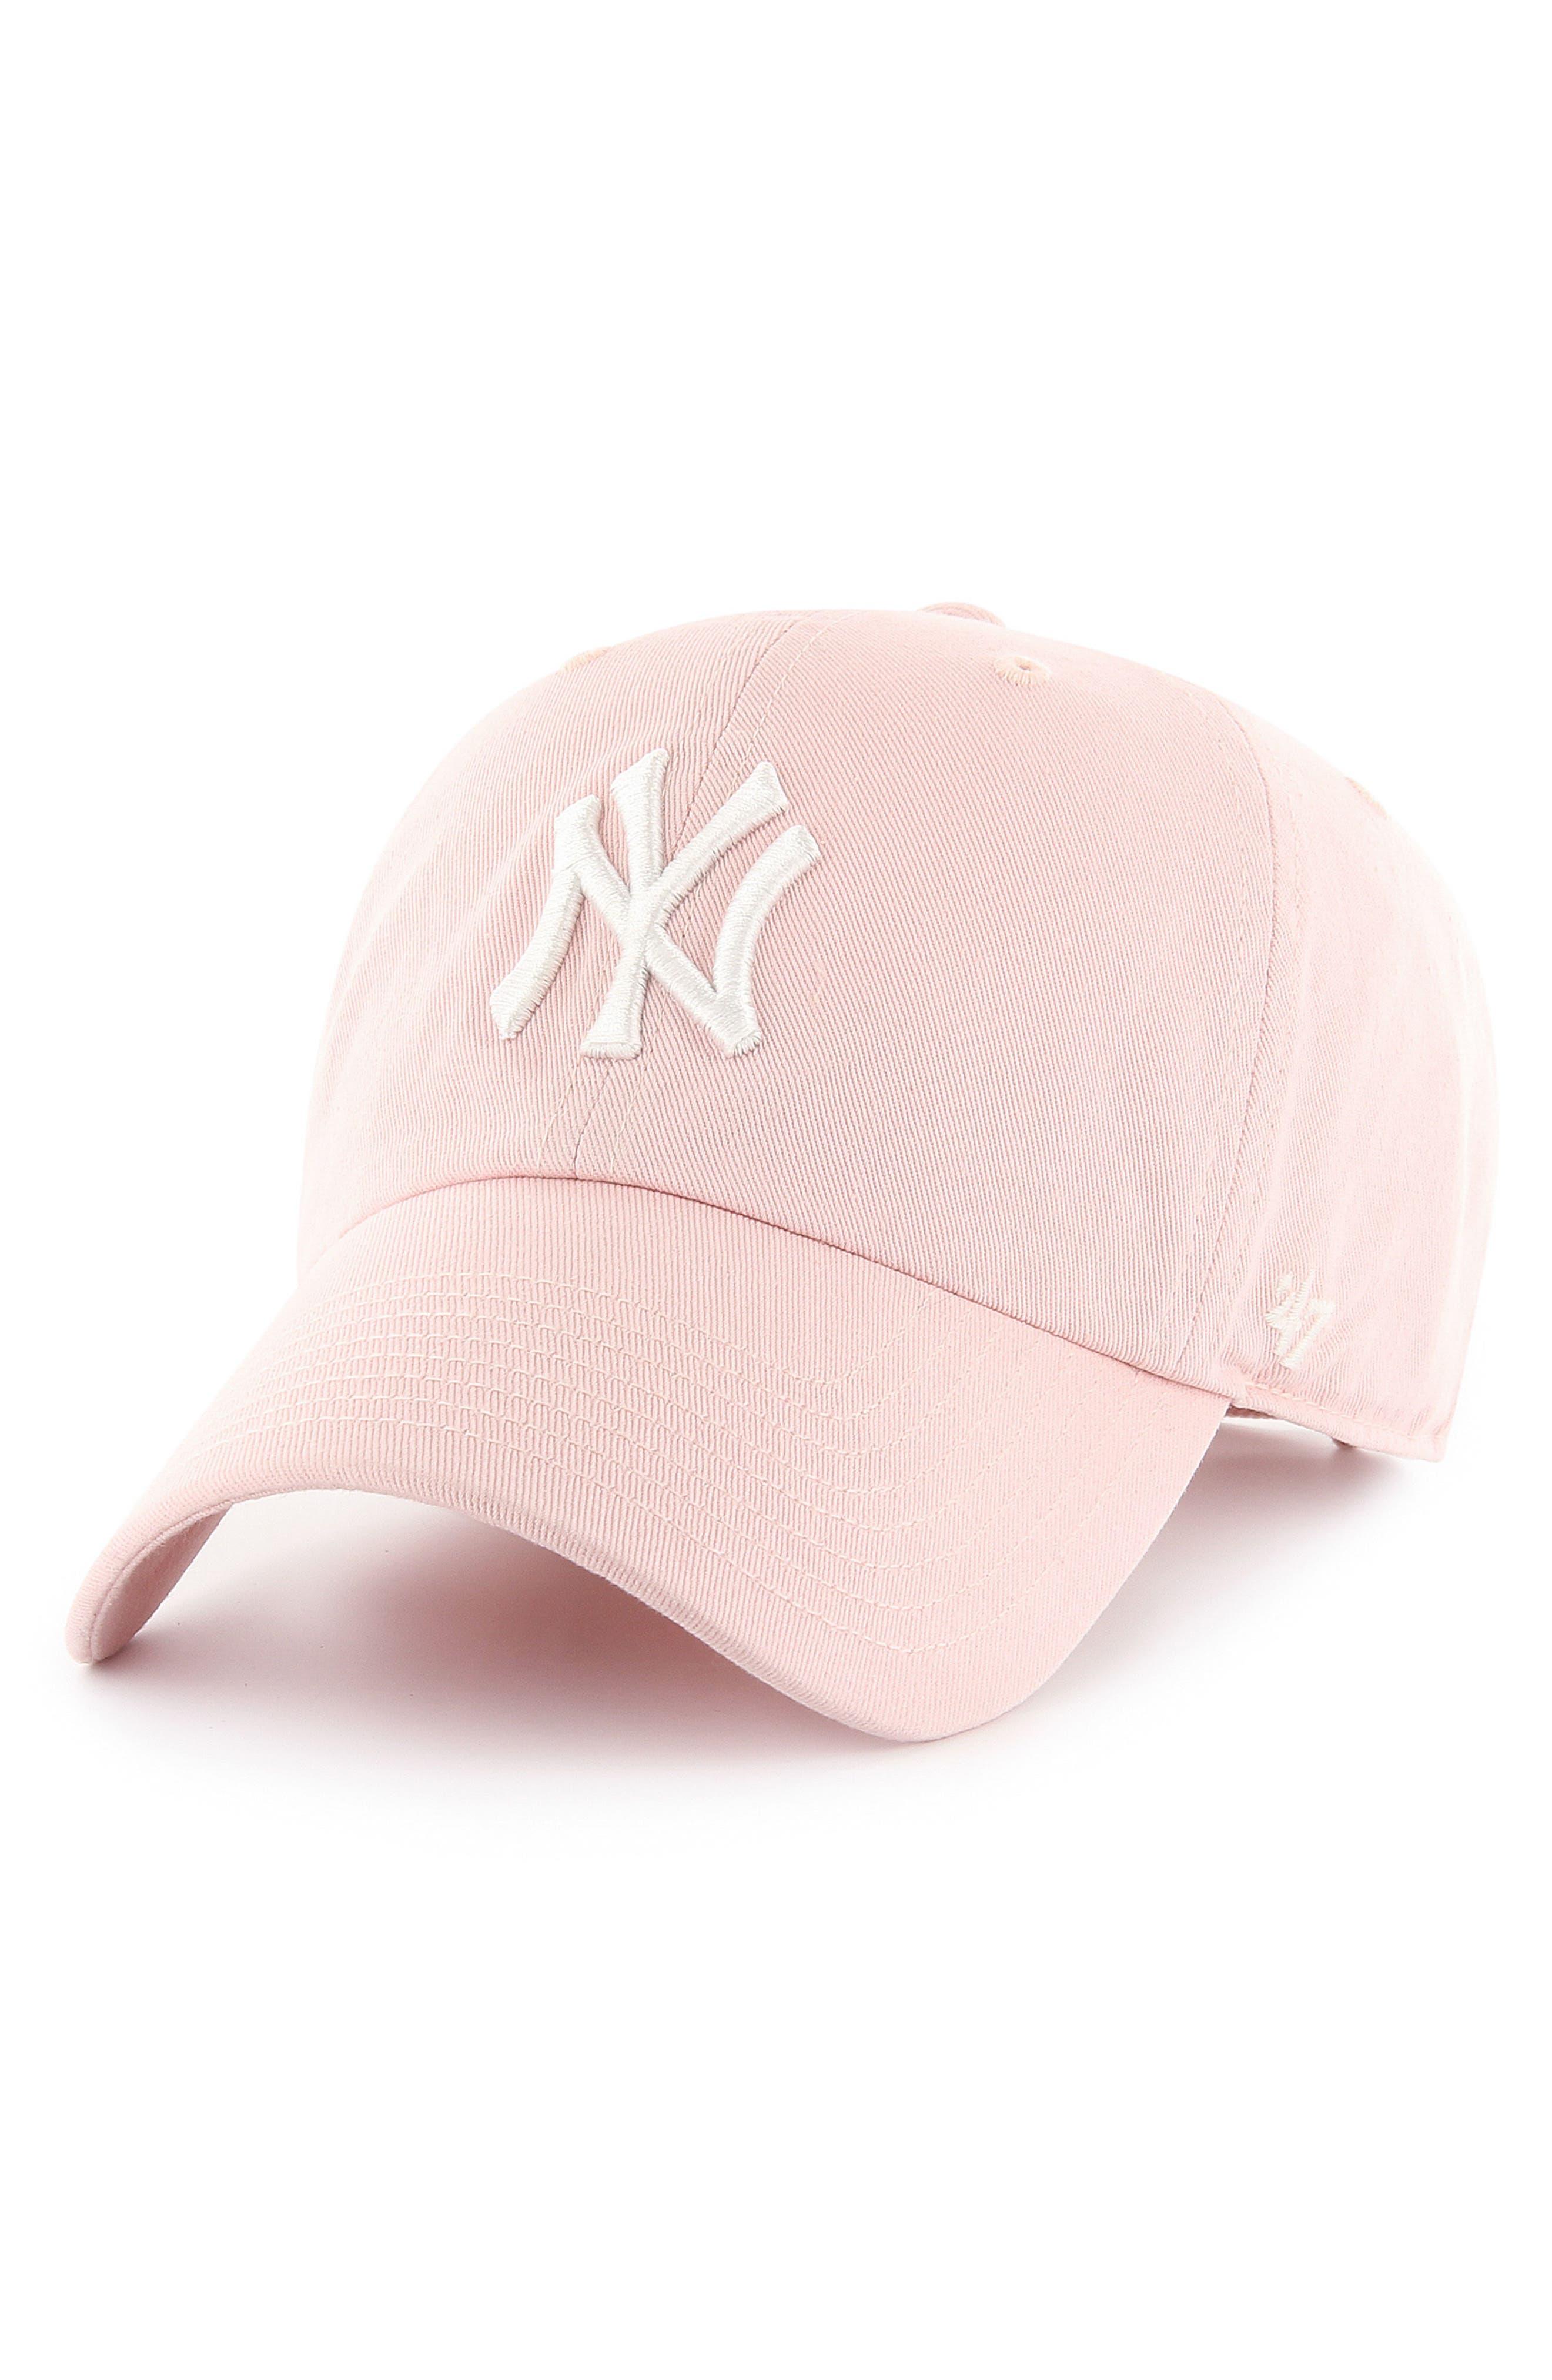 '47 NY Yankees Baseball Cap